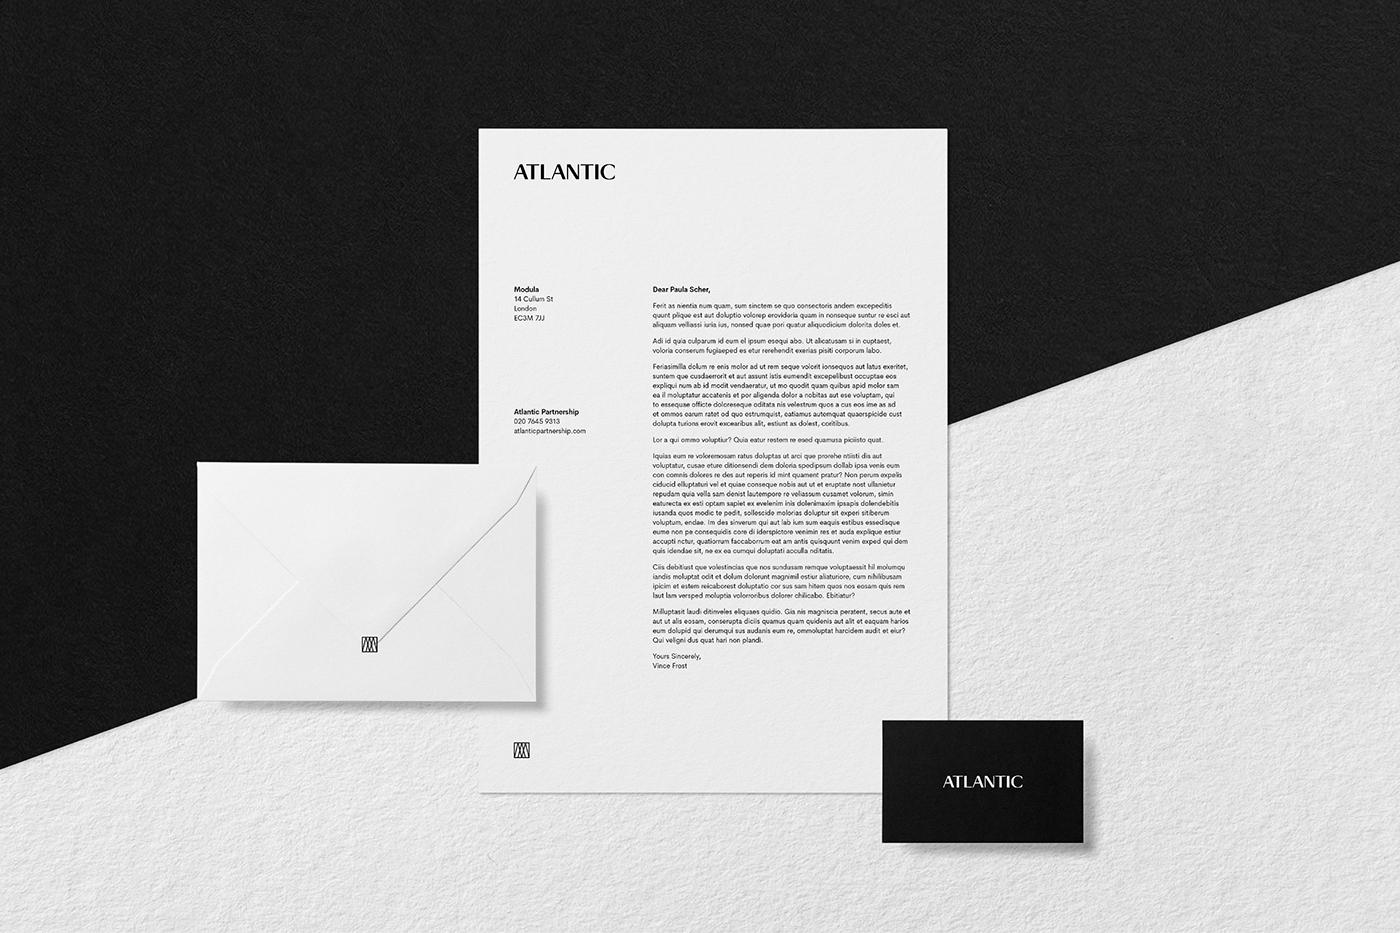 Atlantic品牌设计 欣赏-第14张